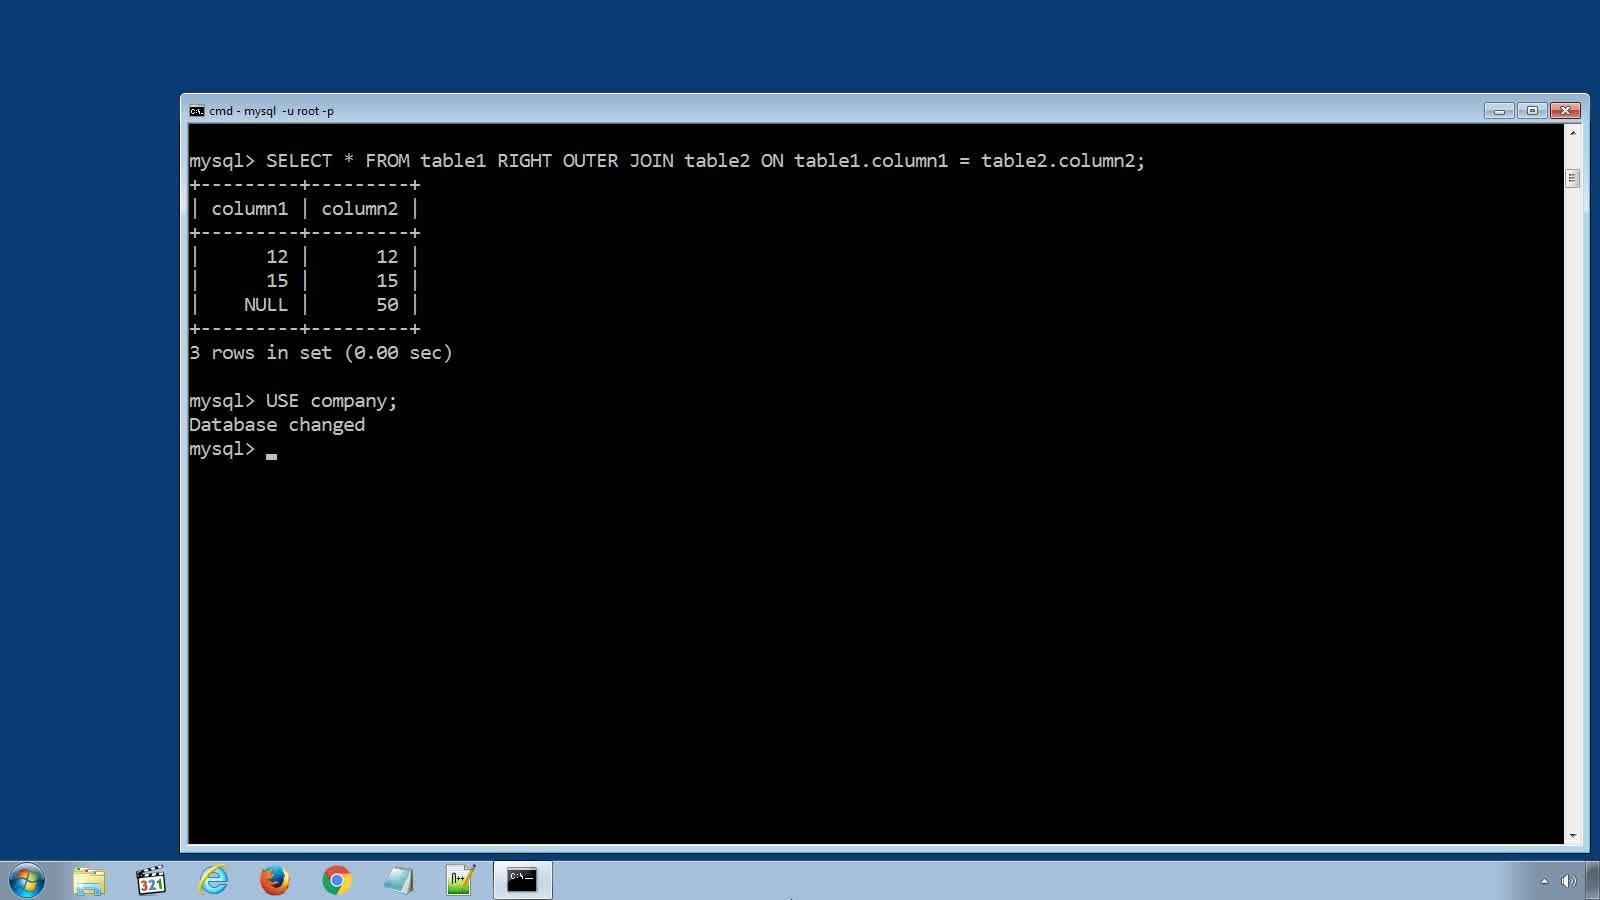 Sql tutorial learn sql with mysql database beginners to expert sql tutorial learn sql with mysql database beginners to expert pradnyankur nikam skillshare baditri Image collections